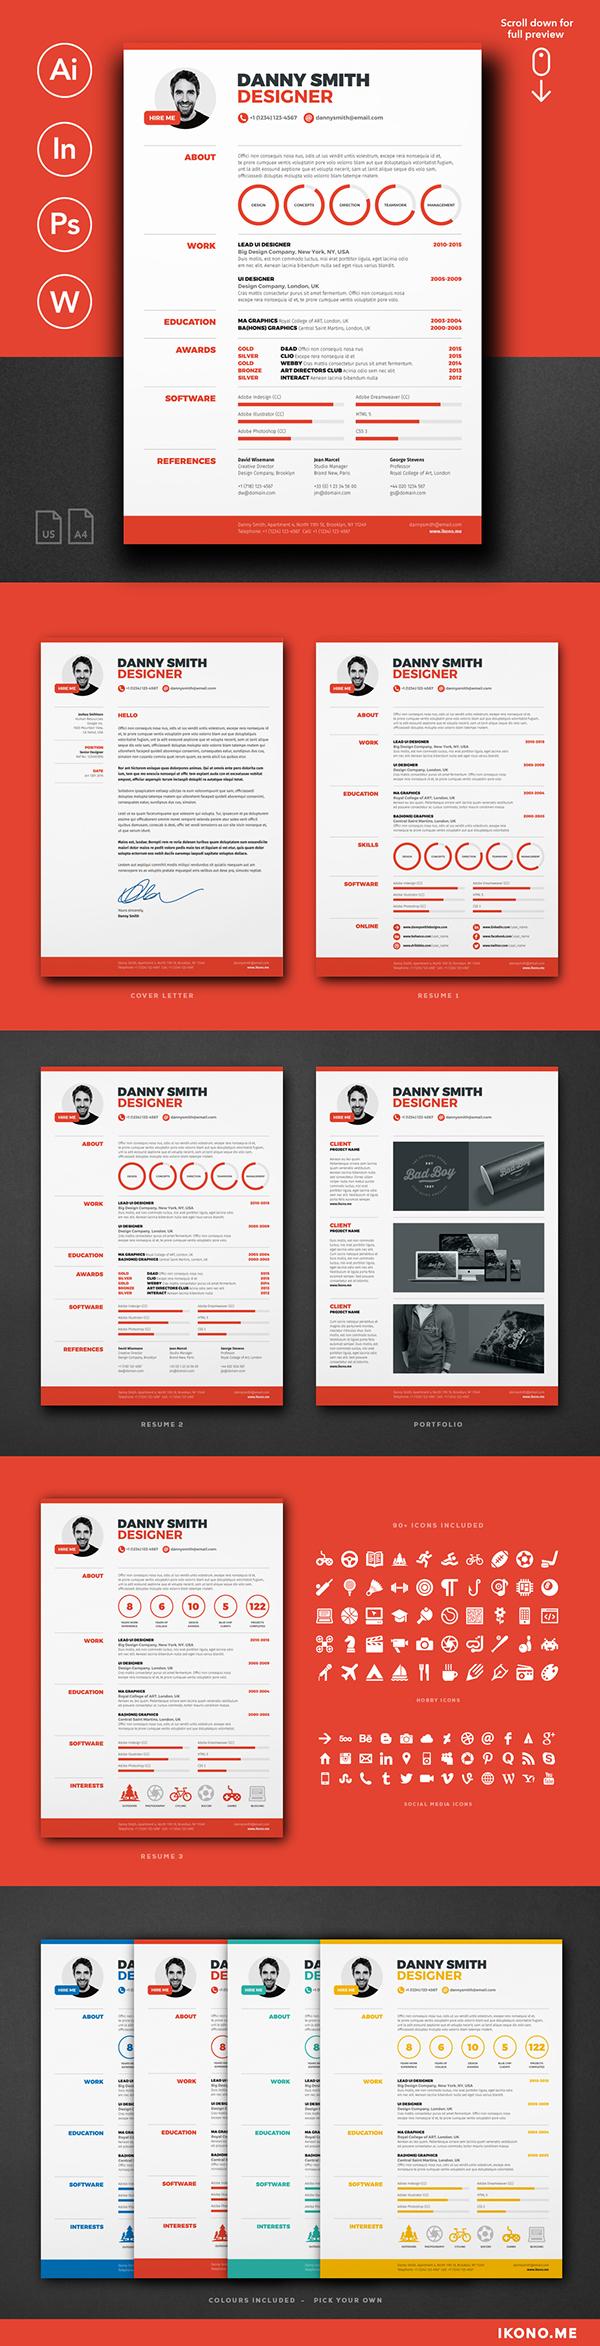 resume template 2 on behance